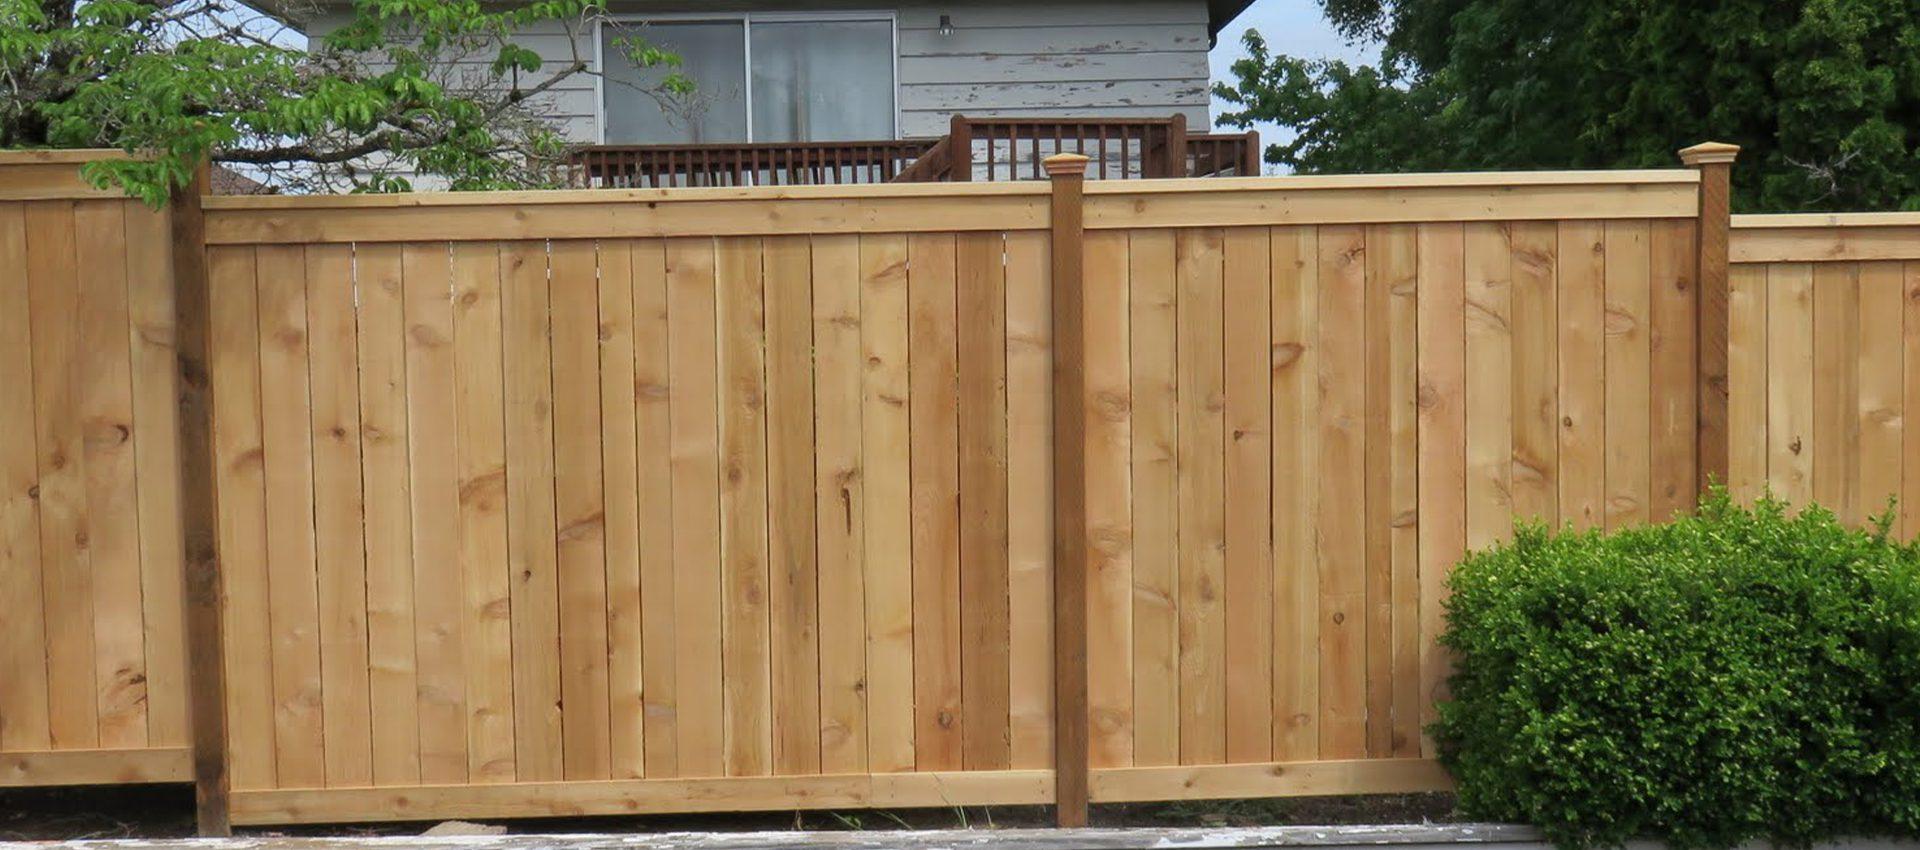 Cedar Picture Frame Fence